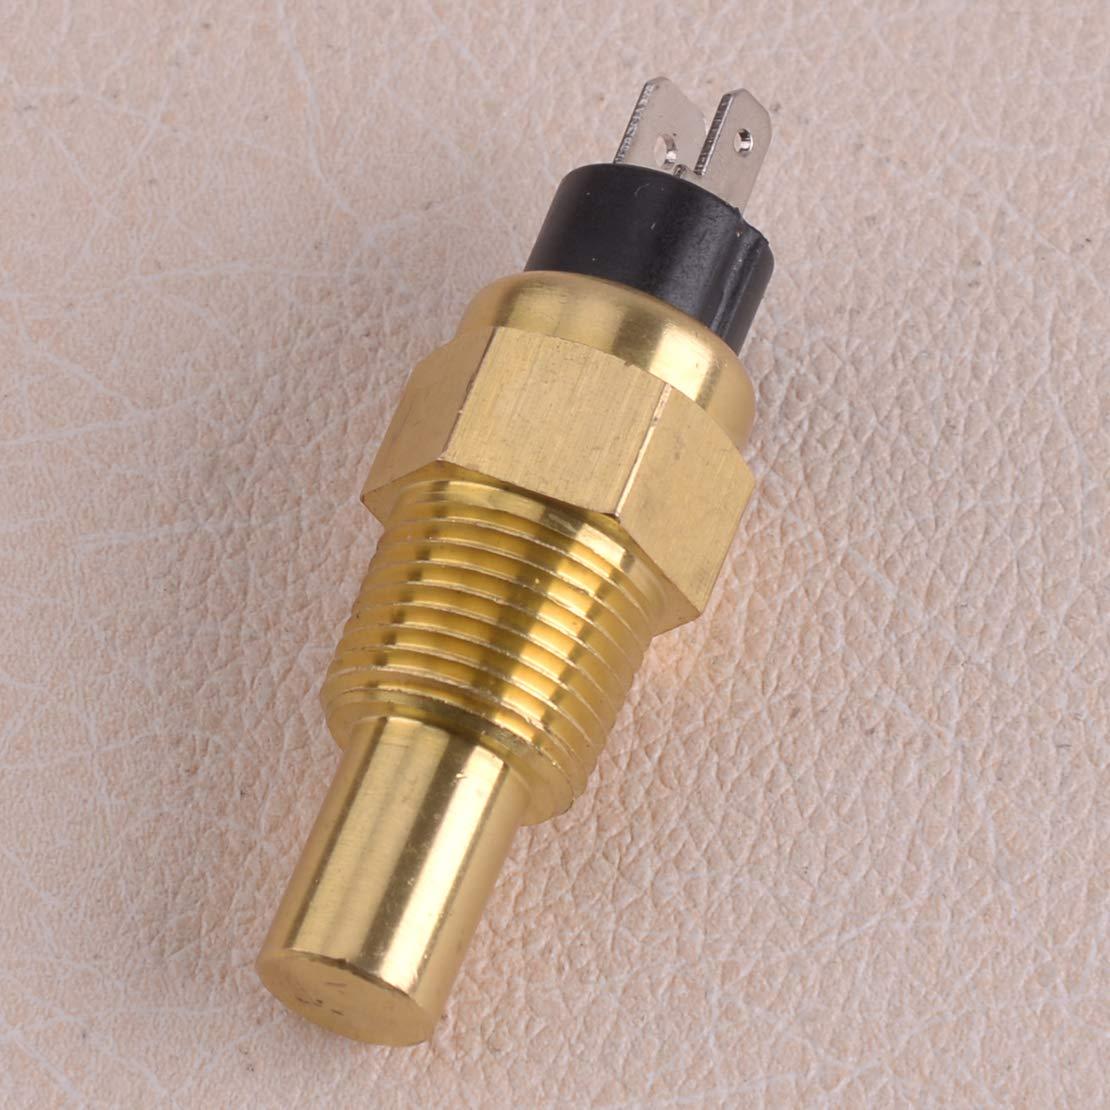 CITALL 3//8 NPT Gewinde Universal Wassertemperatur-Sensor Sender Kit